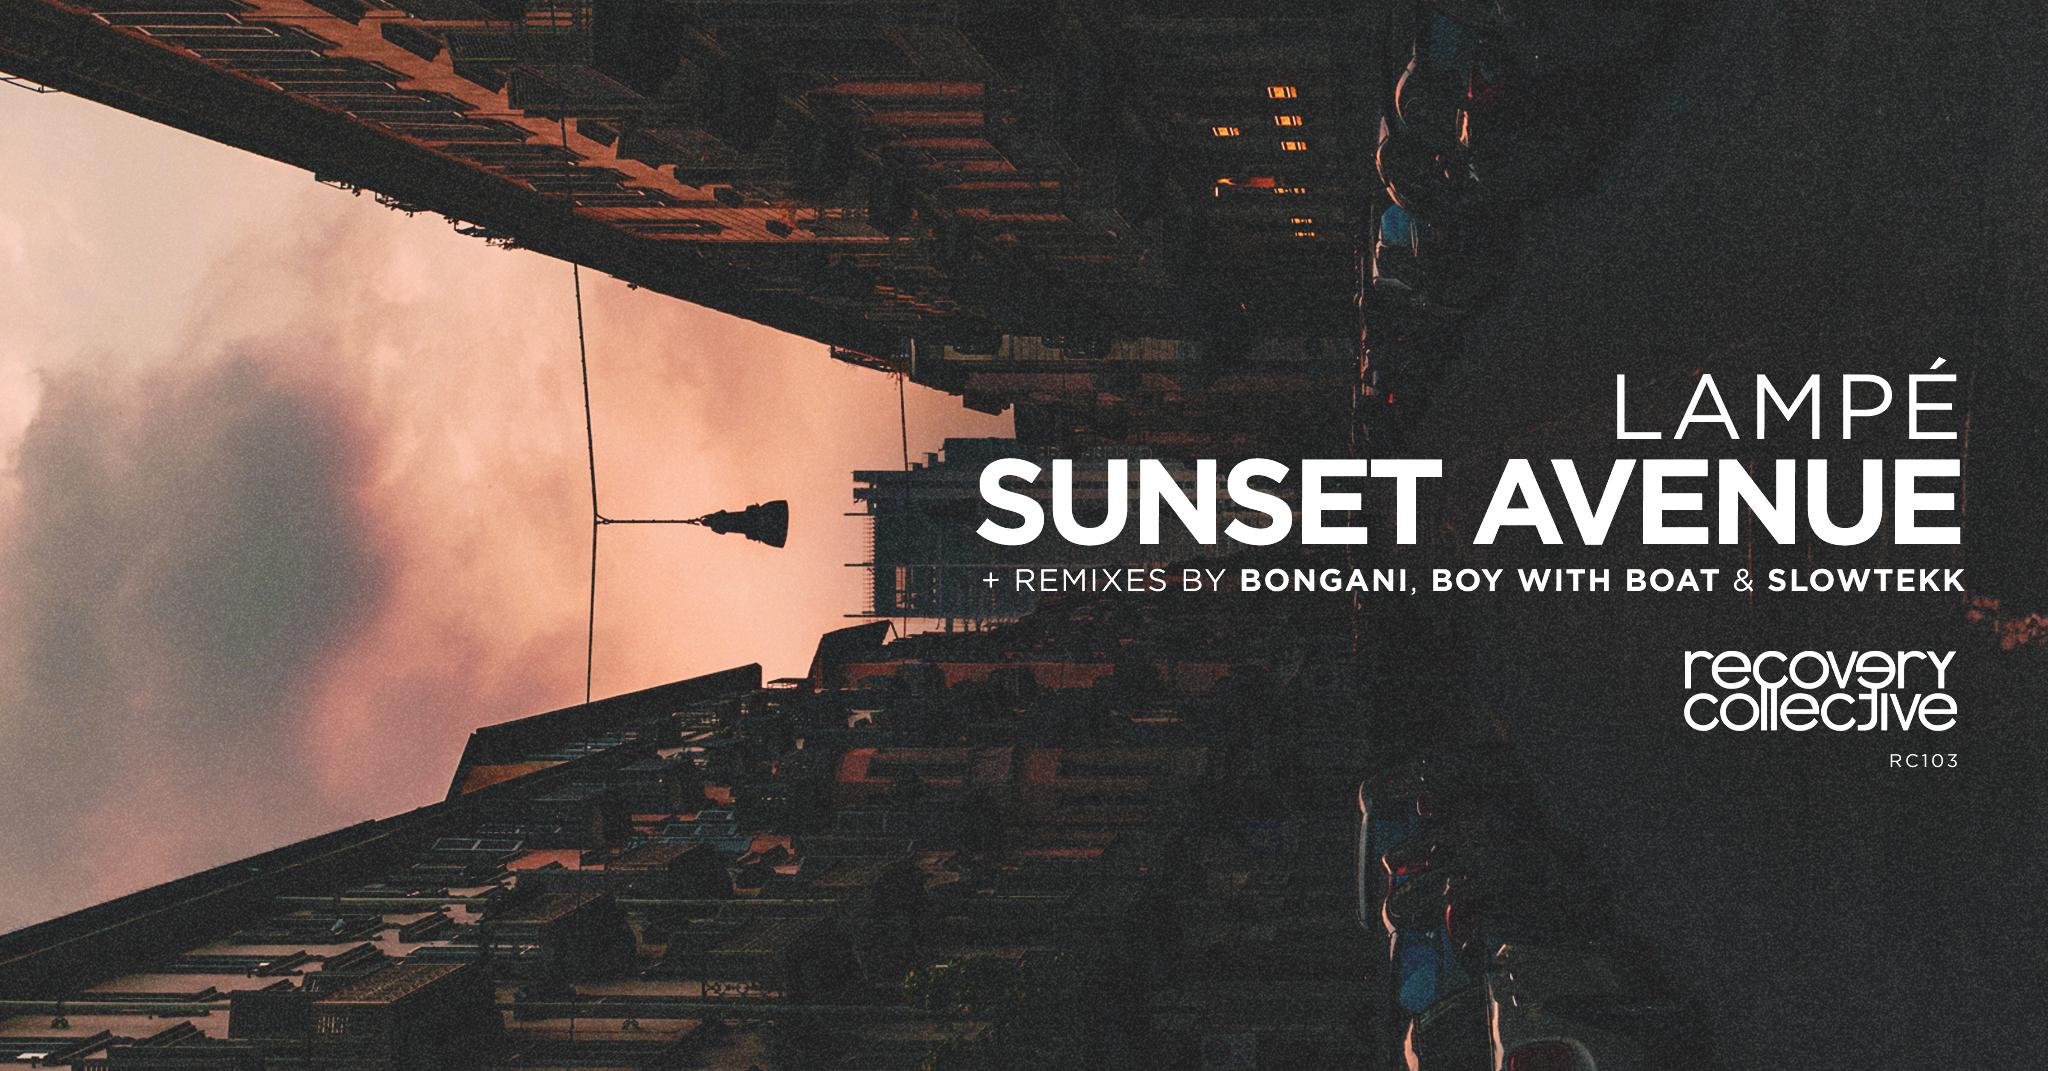 Lampe-Sunset-Avenue-Cover-Art-FINAL